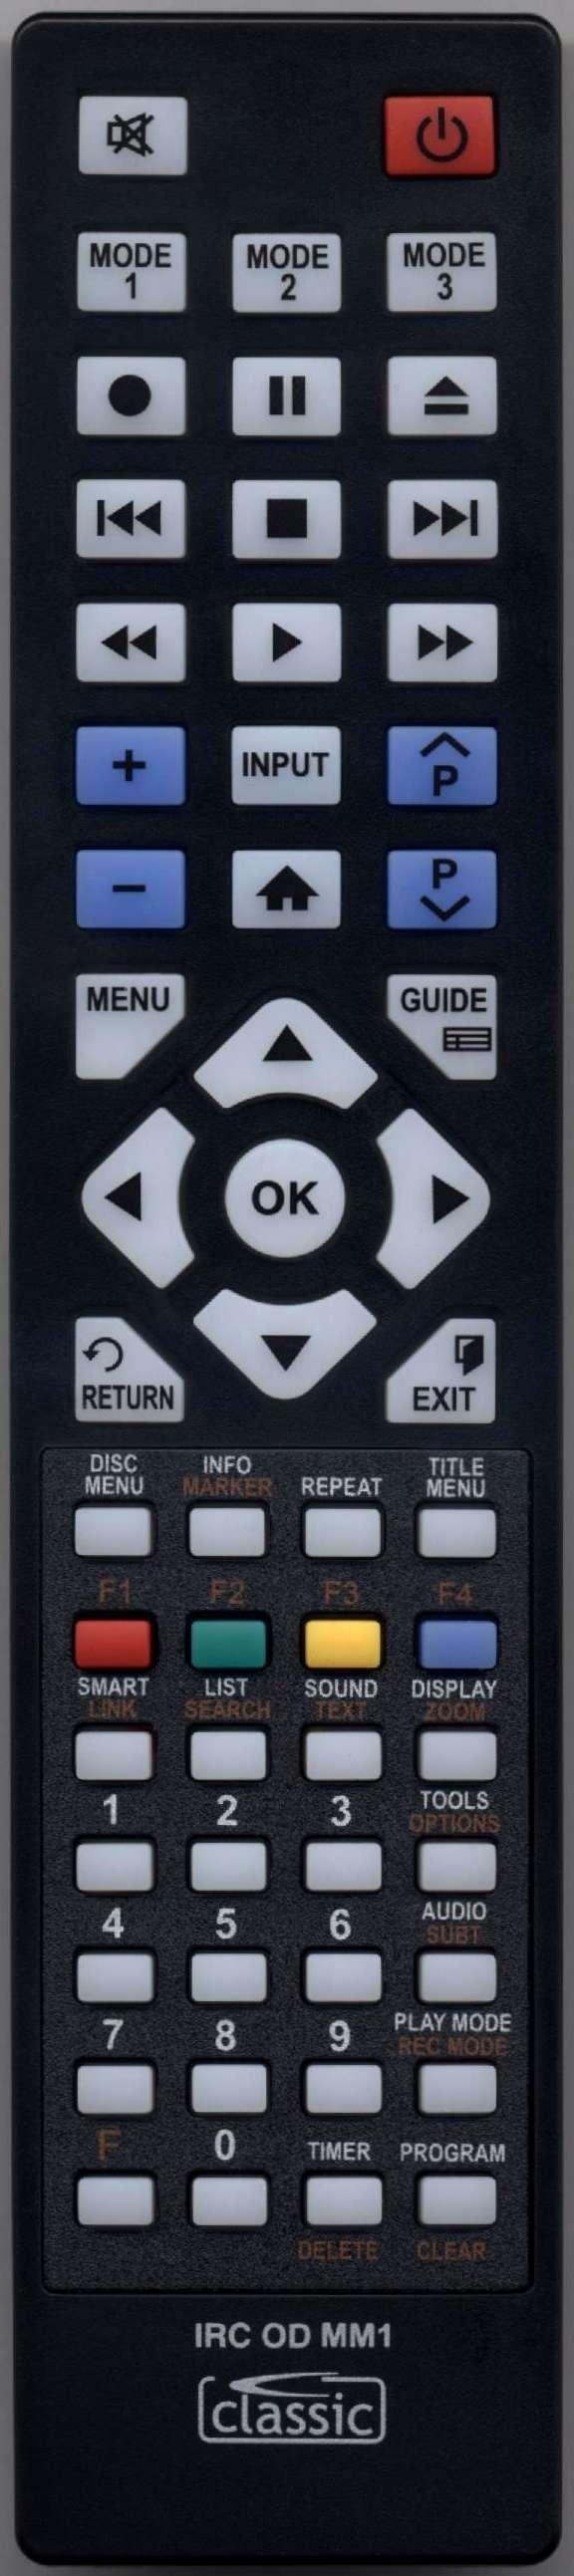 SAMSUNG AK59-00125A Remote Control Alternative